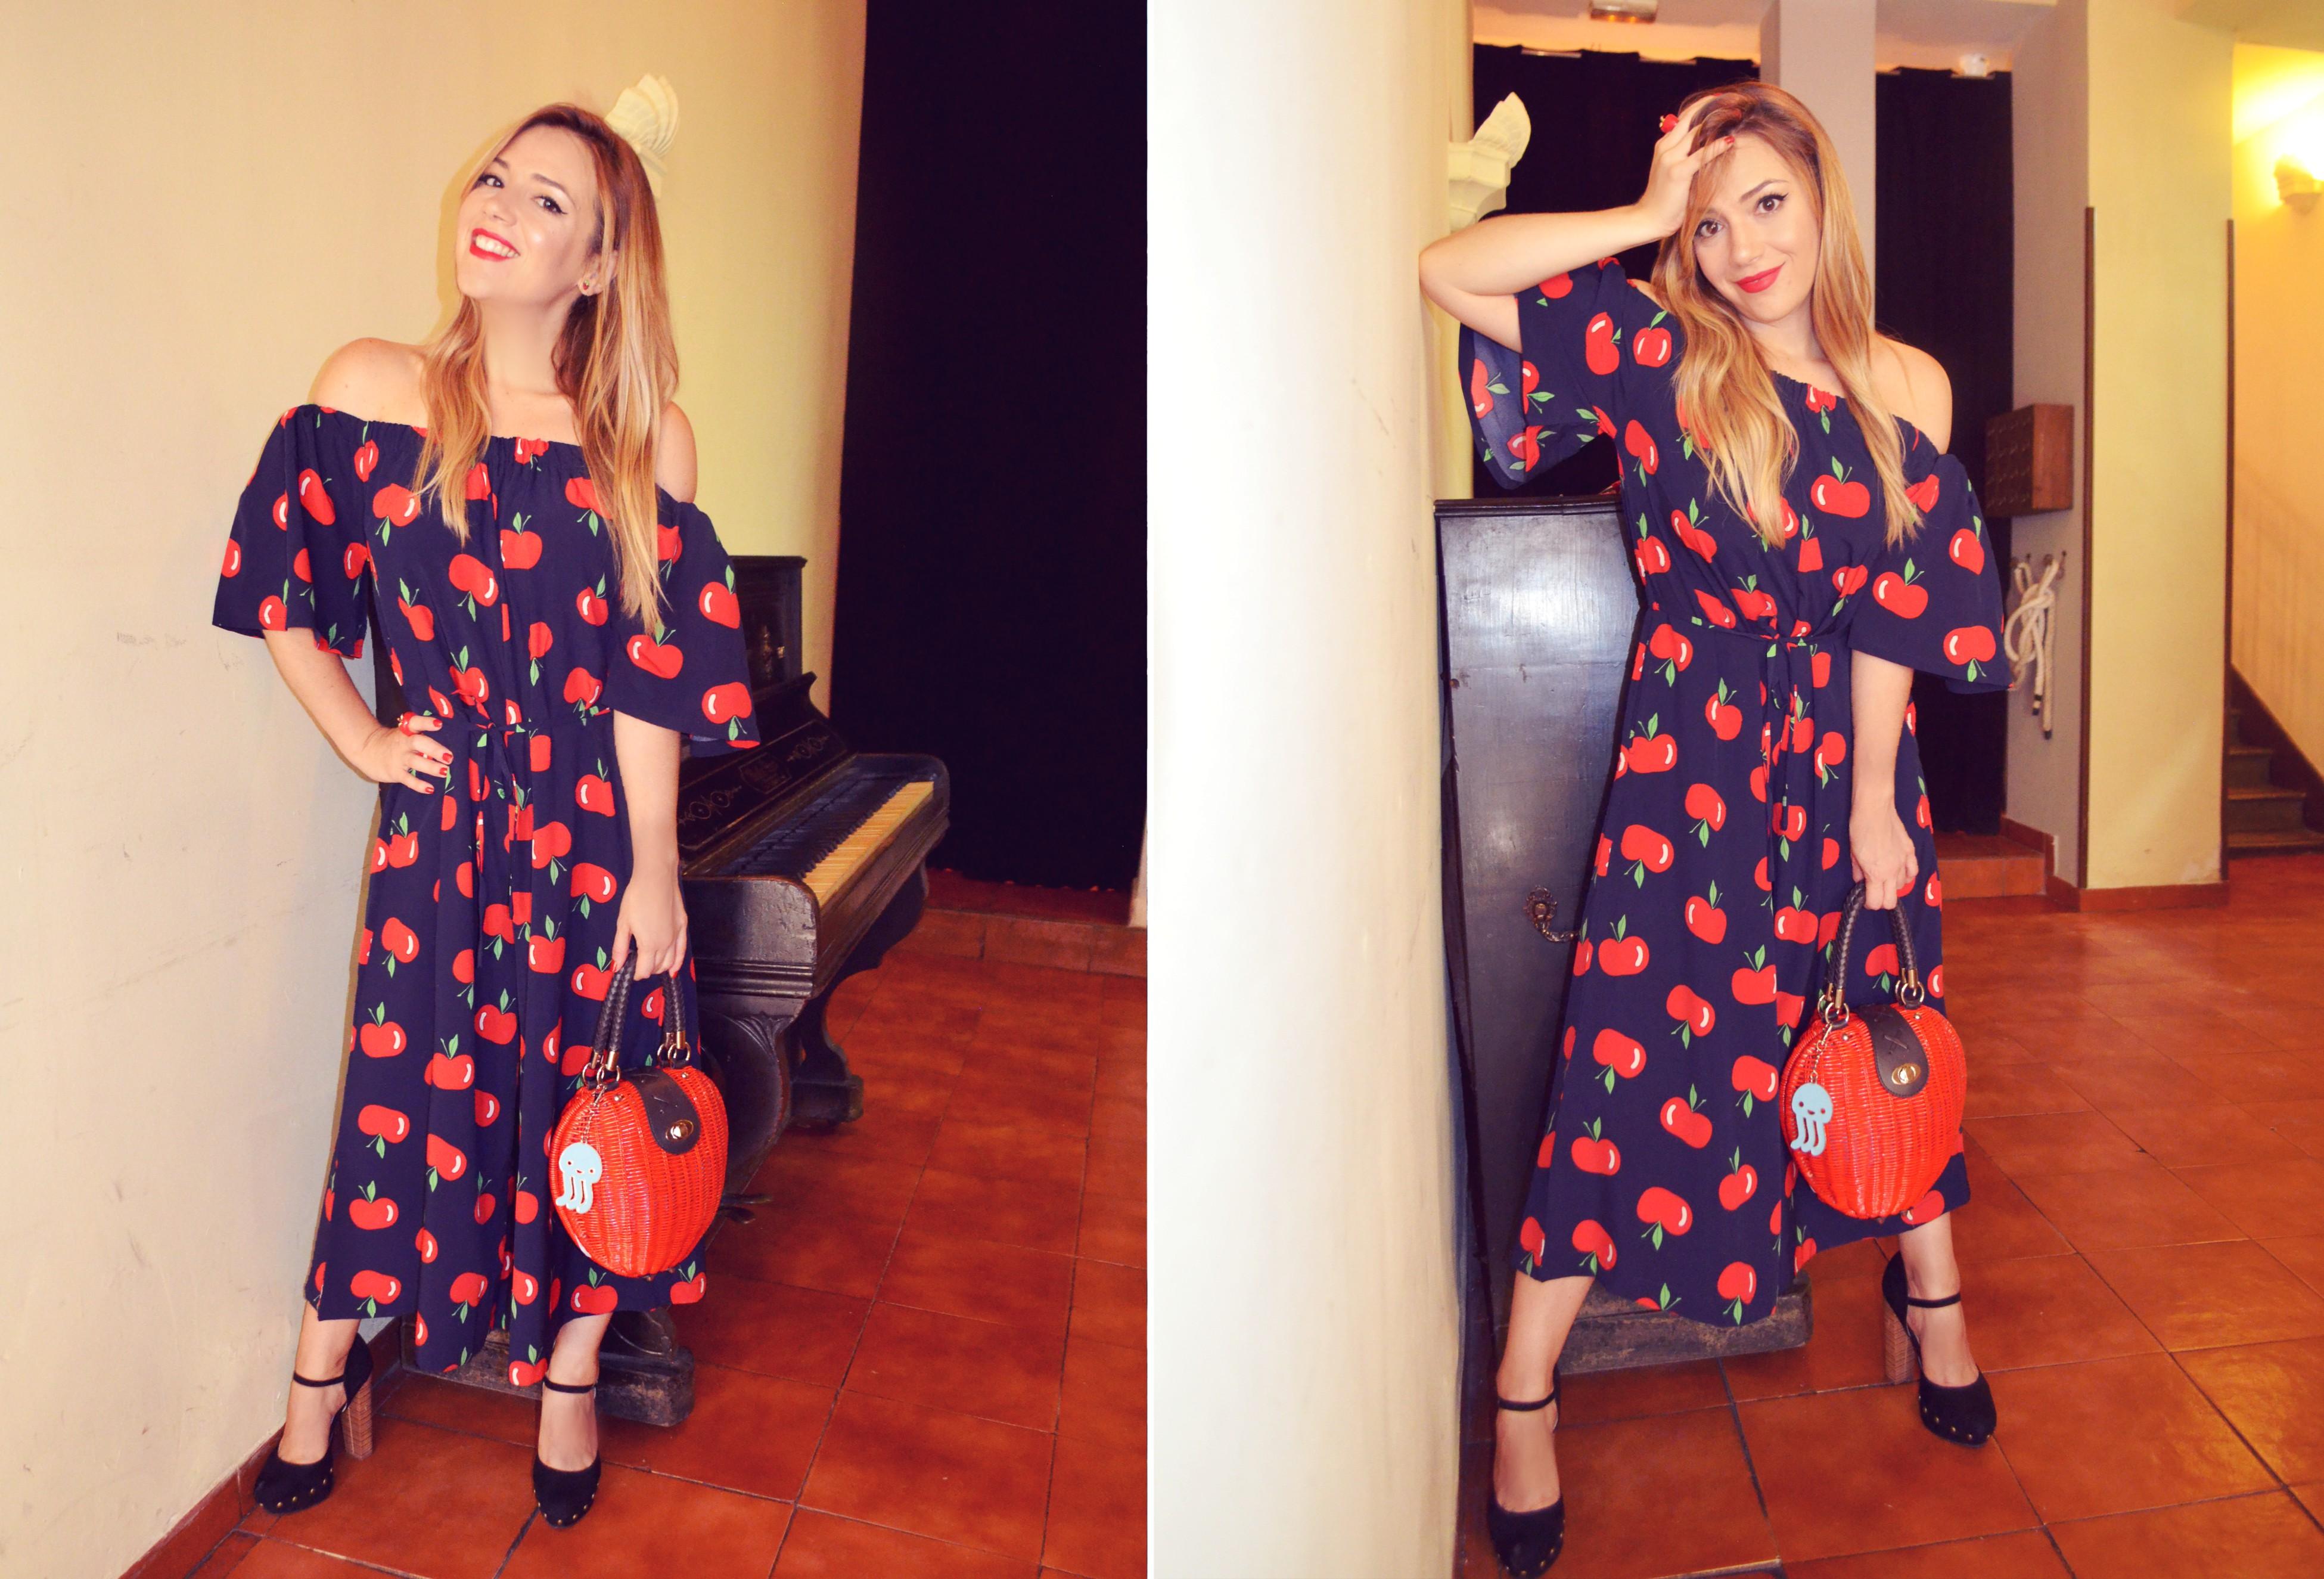 Influencer-spain-smile-ropa-ChicAdicta-fashionista-blog-de-moda-Chic-Adicta-look-rojo-jumpsuit-outfit-PiensaenChic-Piensa-en-Chic